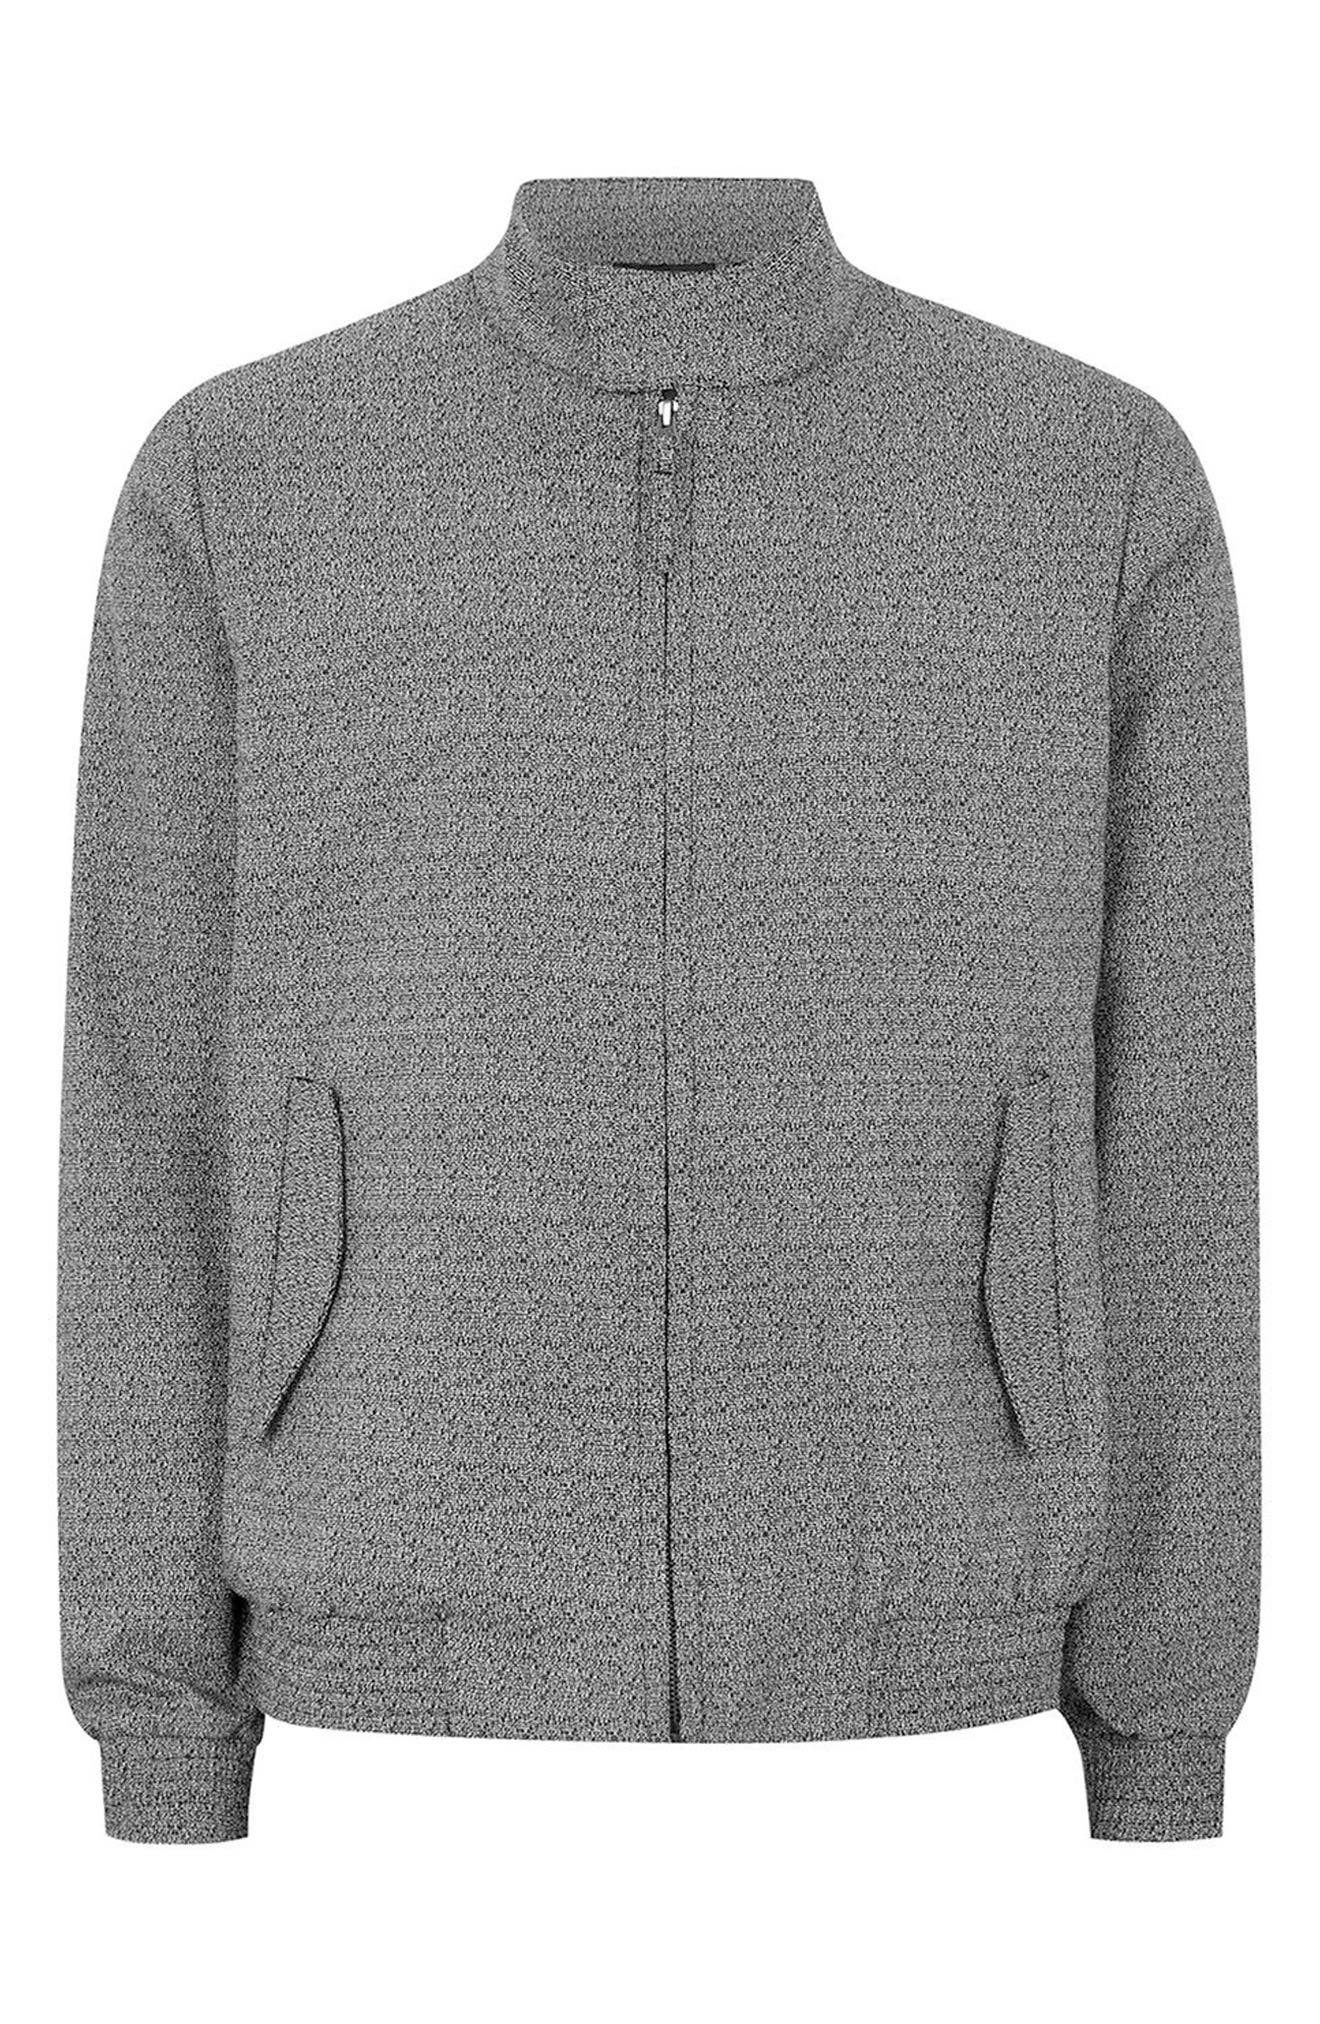 Textured Harrington Jacket,                             Alternate thumbnail 4, color,                             021